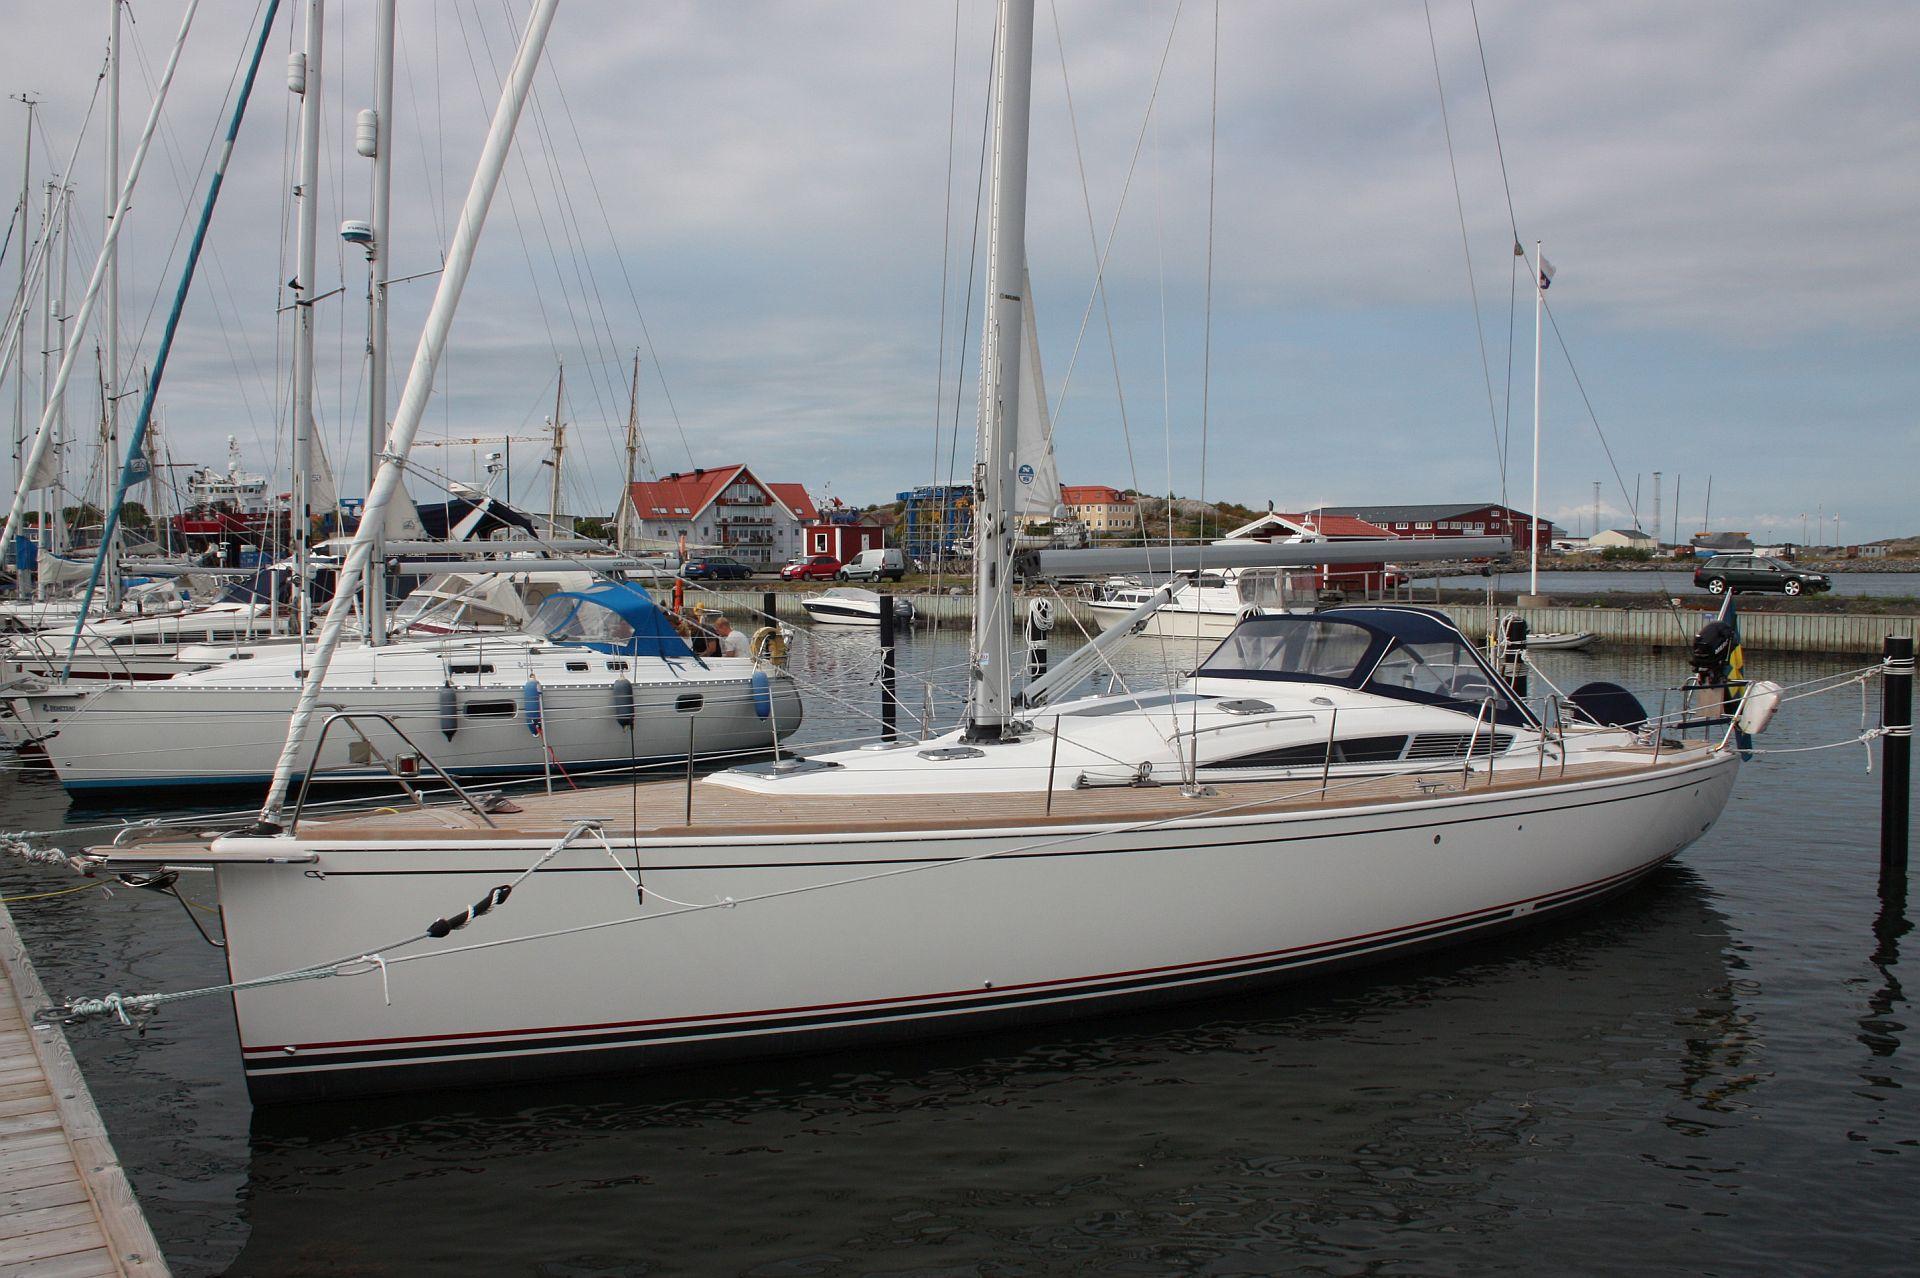 Gebrauchtboot%20Maxi%201300%20(5).jpg